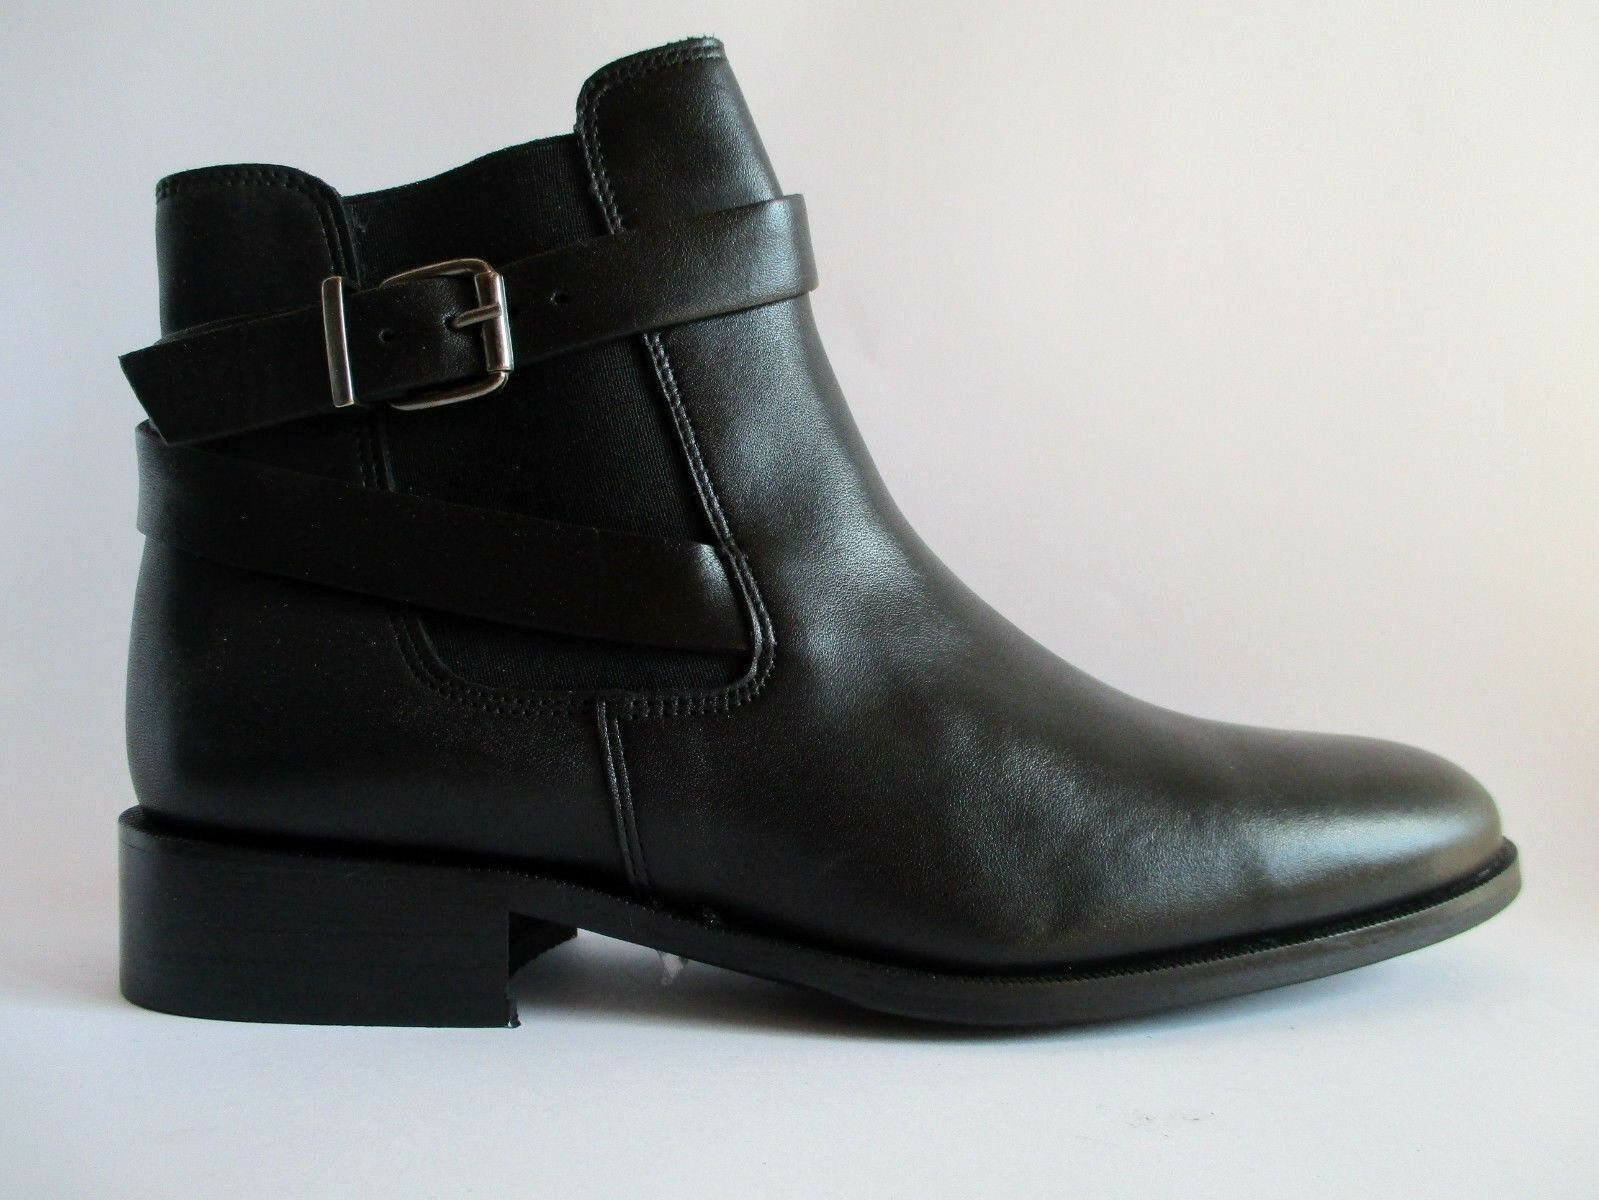 ZIGN Klassische Halbschuhe Ankle  Chelsea Boot Leder Schwarz Gr.39  Ankle C5 2b3698